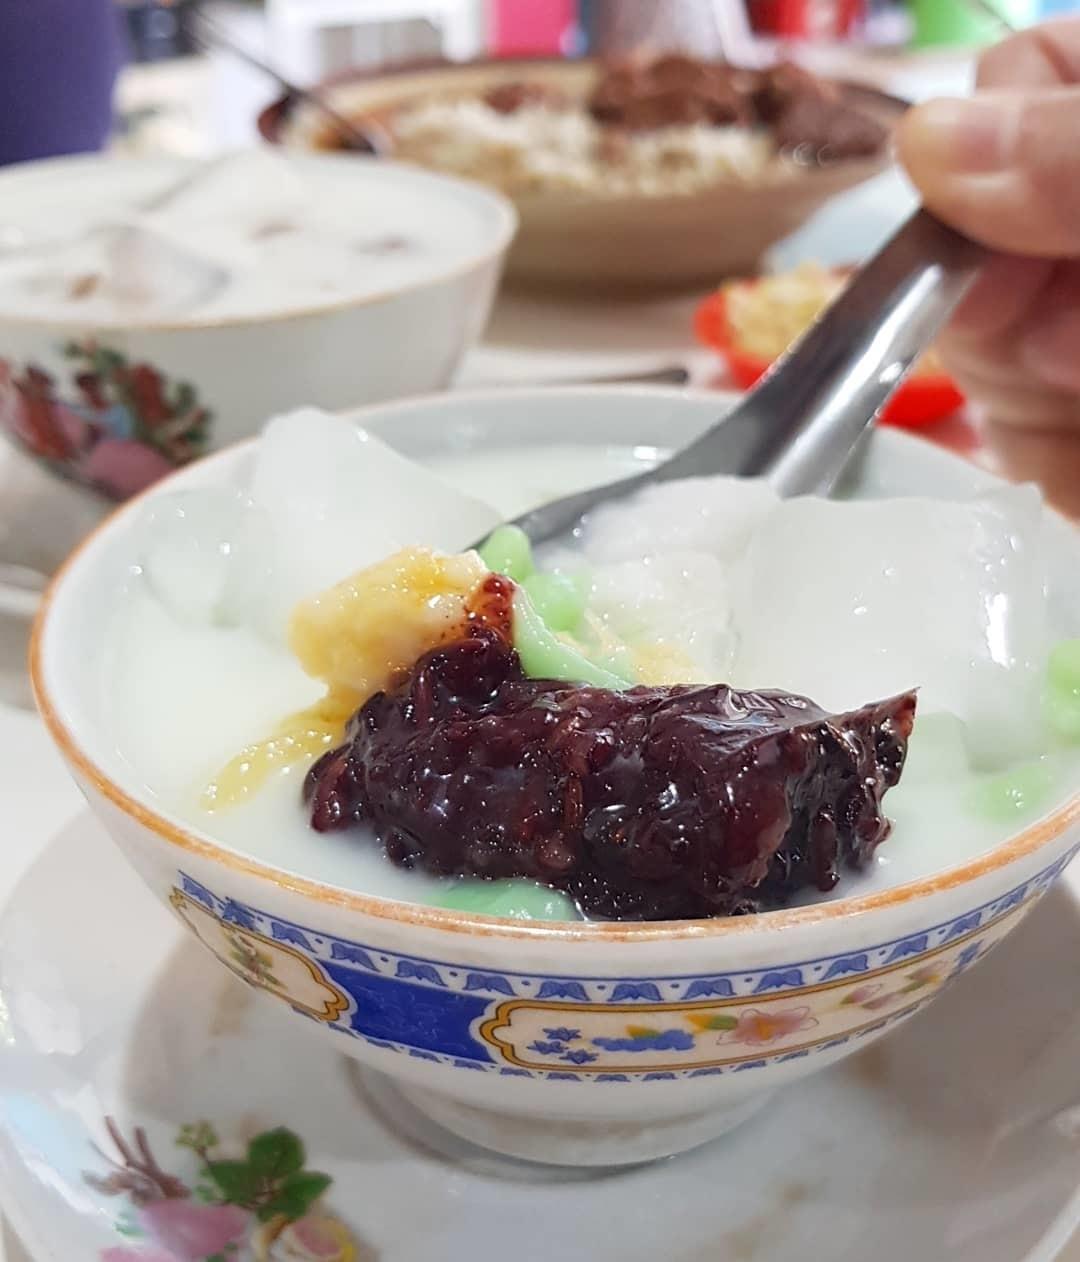 Wisata Kuliner Dawet Sorosutan Madiun